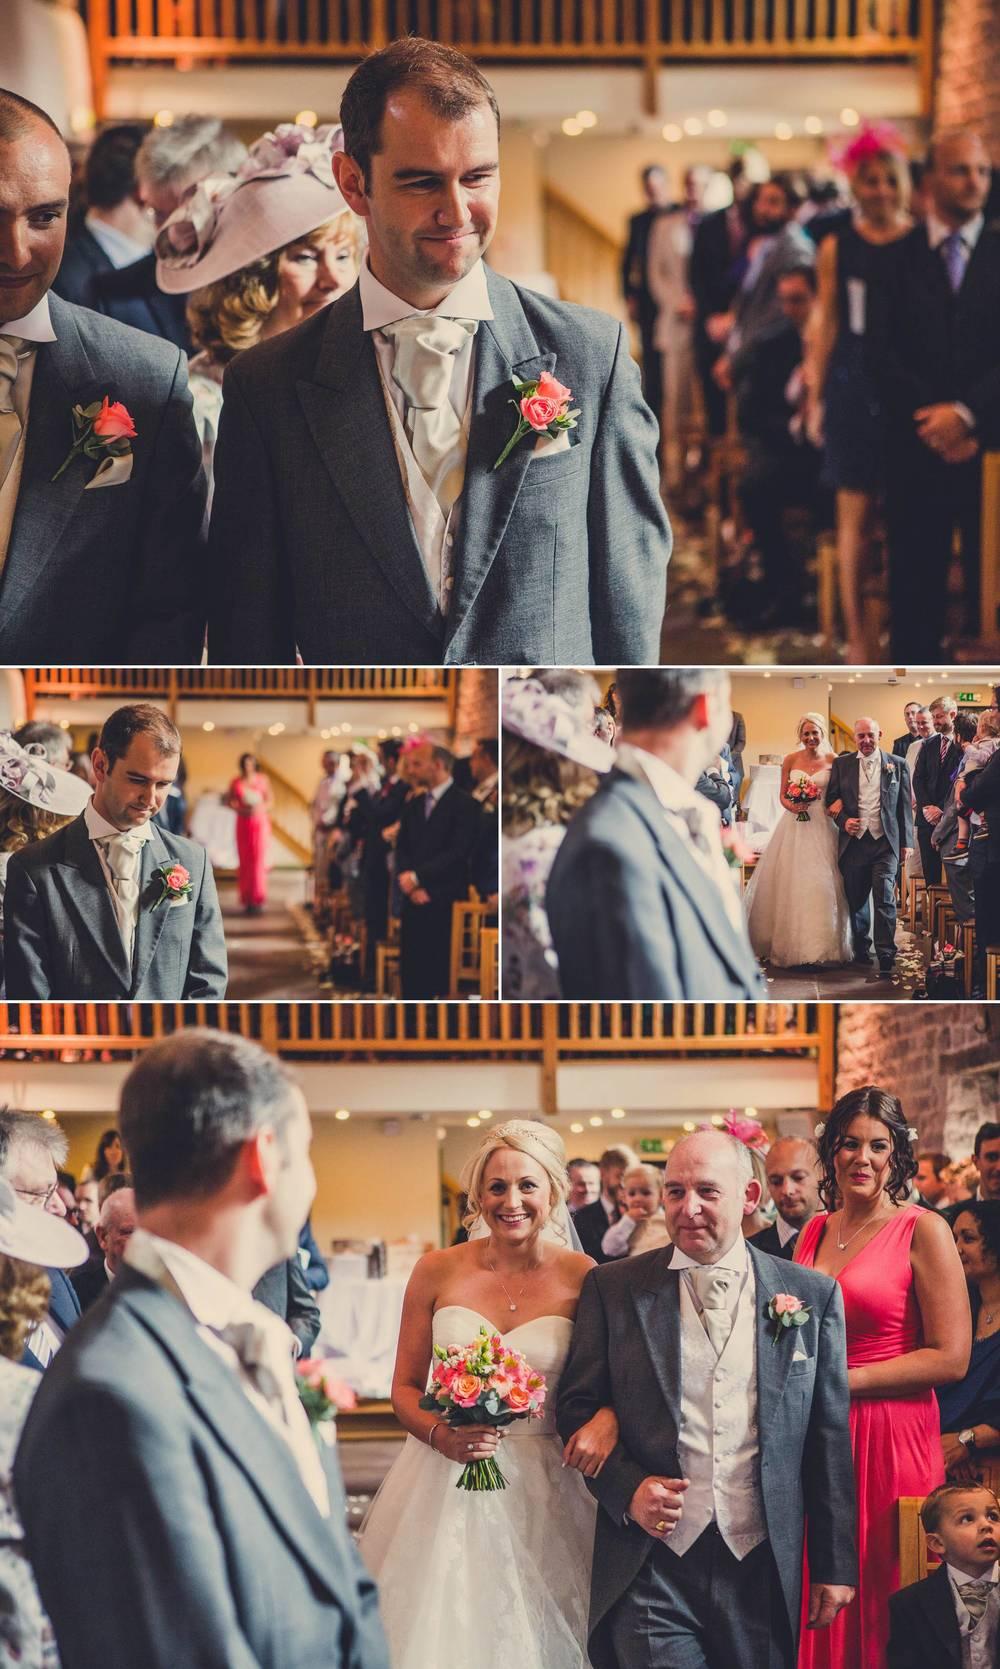 the-ashes-wedding-photographer 8.jpg